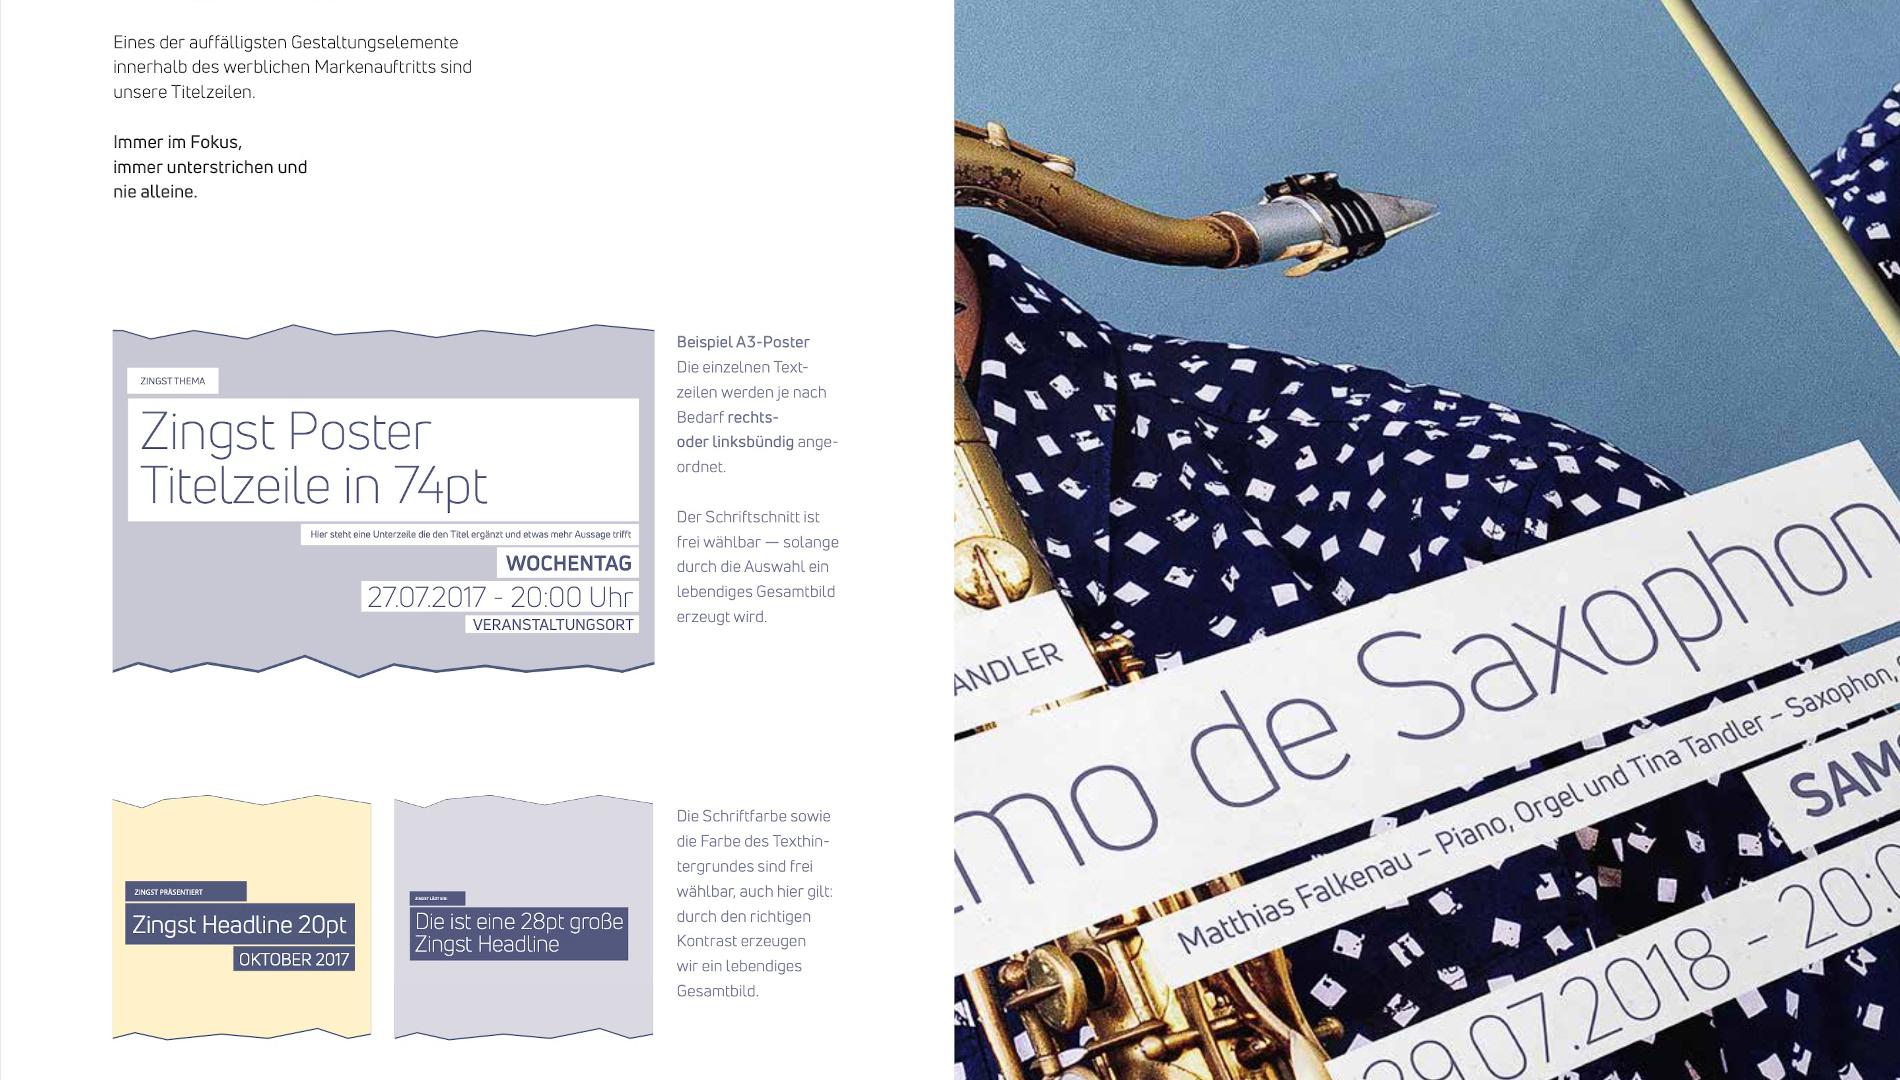 Markenentwicklung Corporate Design Zingst Gestaltungselemente Markenauftritt Going Places